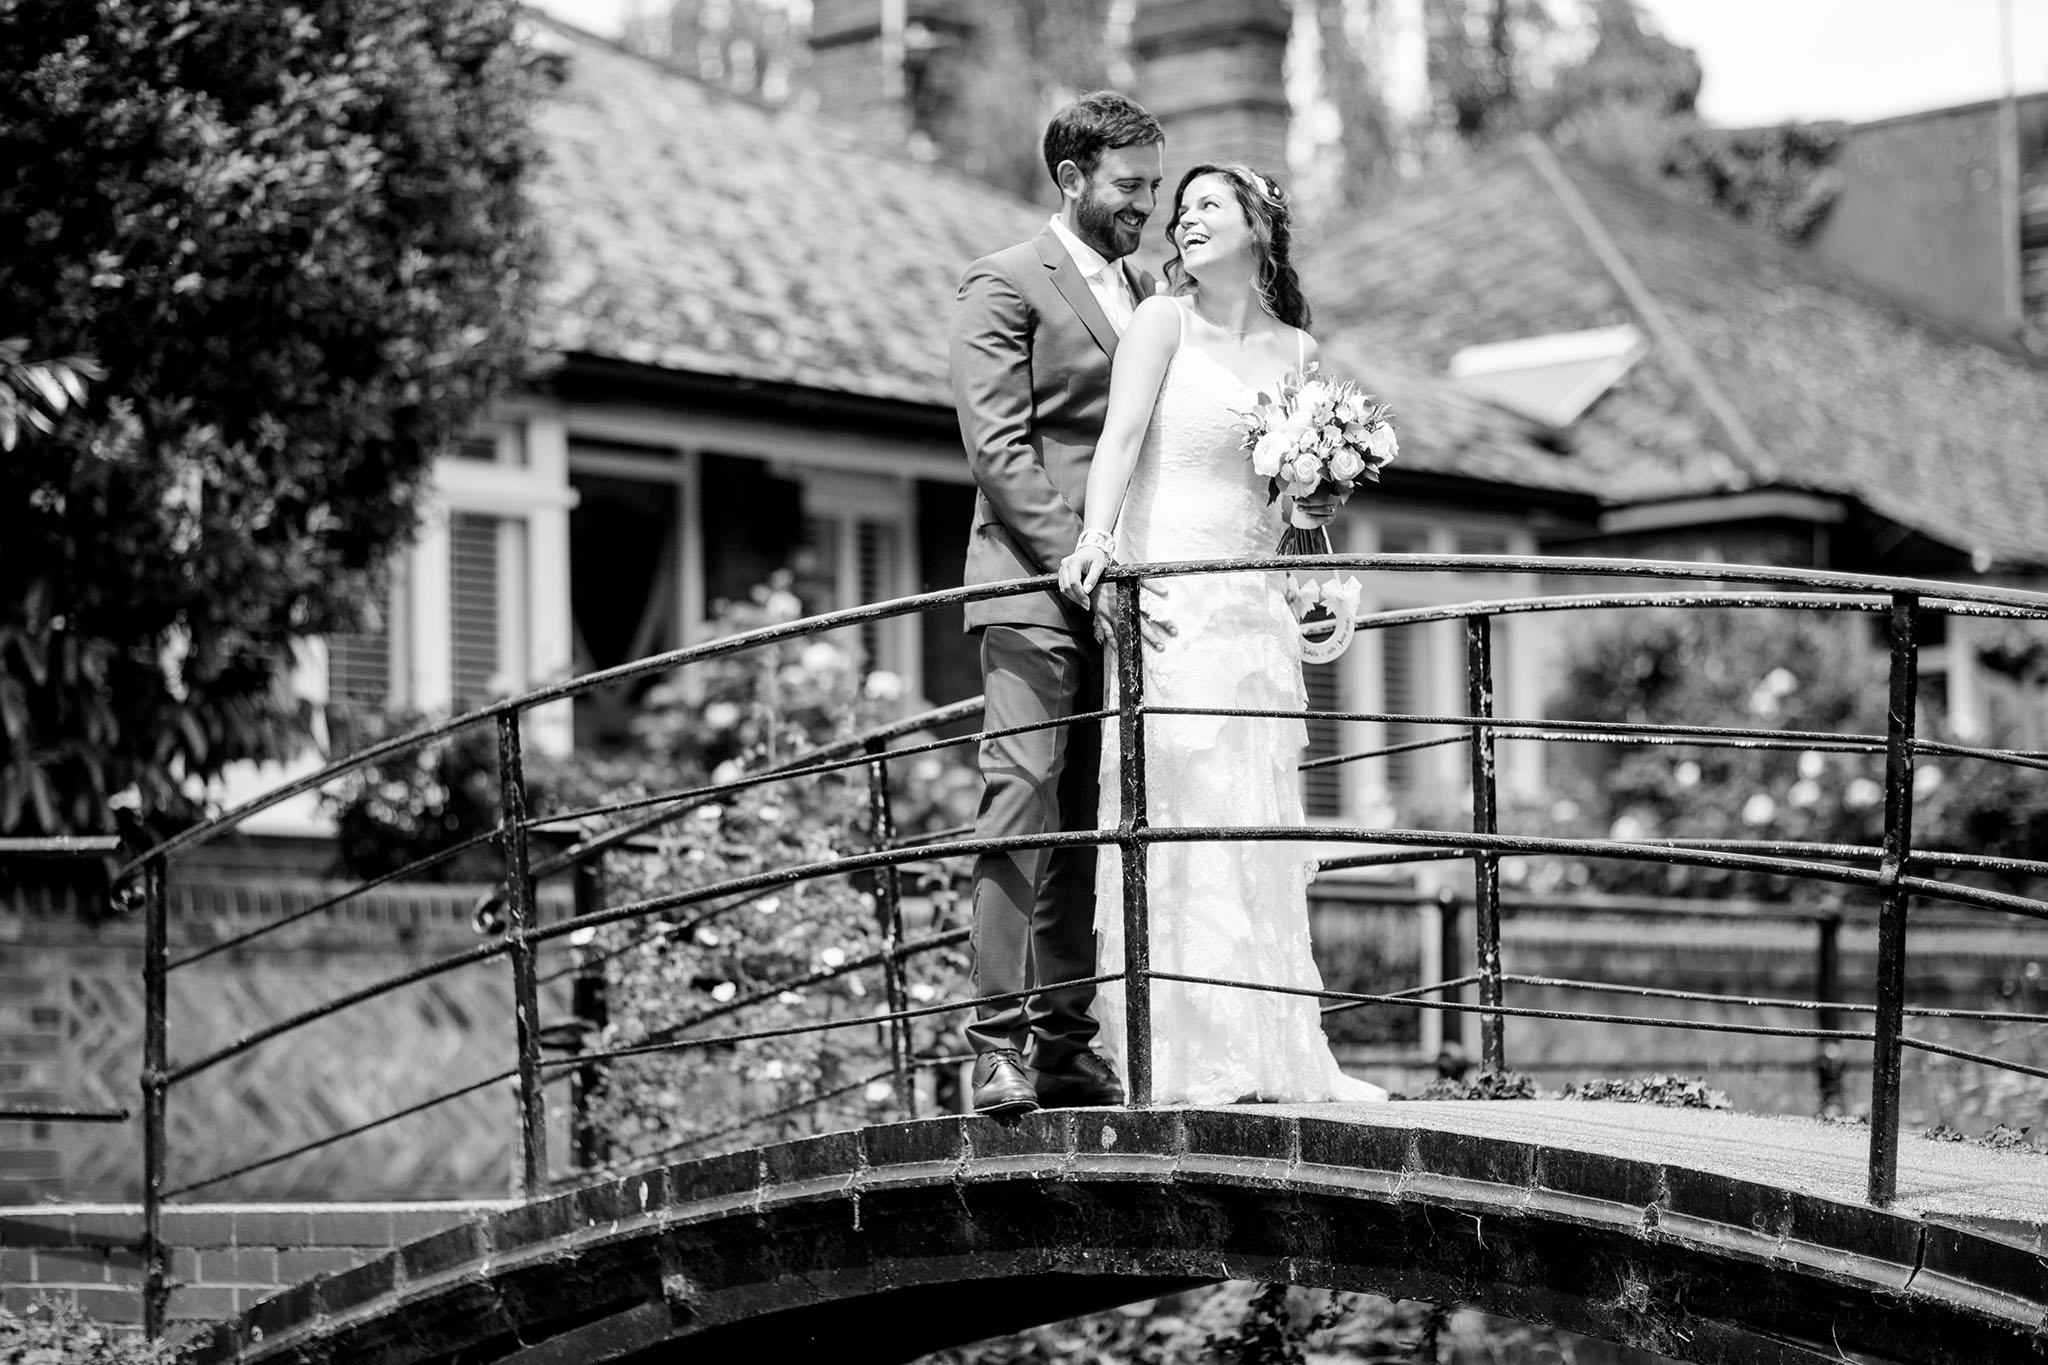 elizabethgphotography_kingslangley_hertfordshire_fineart_wedding_enfield_ricky_nicole_nahlis_34.jpg